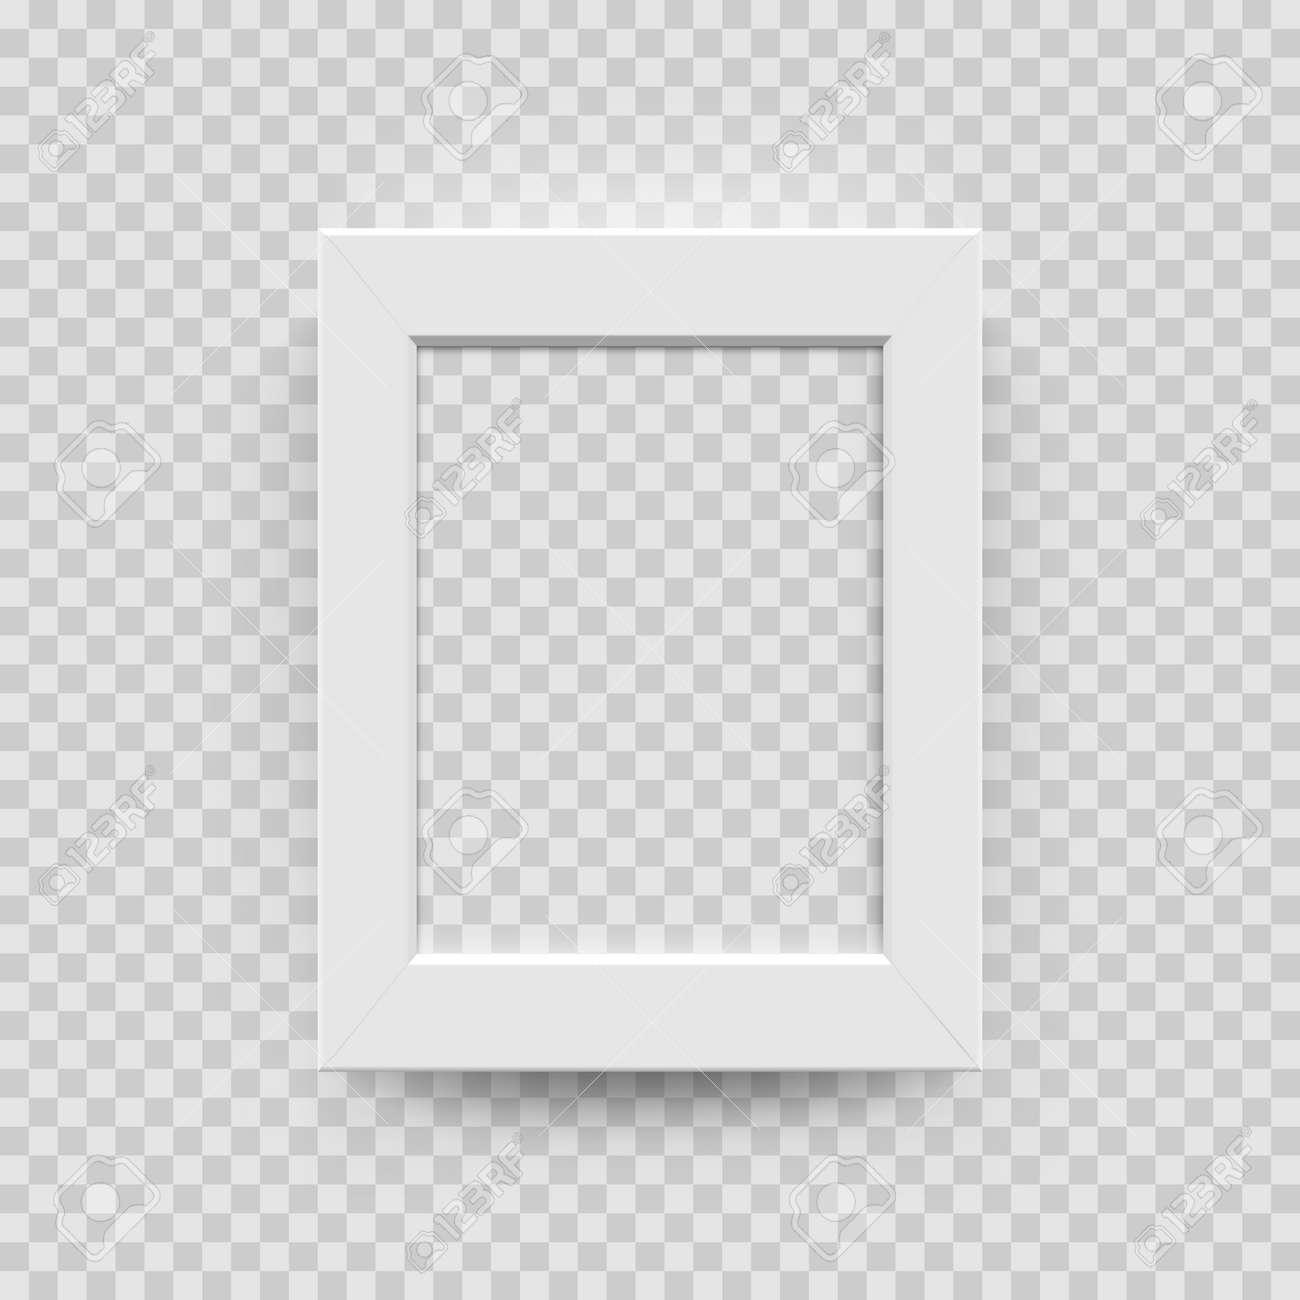 Papel Blanco Del Marco De La Foto, Plantilla Plástica O De Madera 3D ...